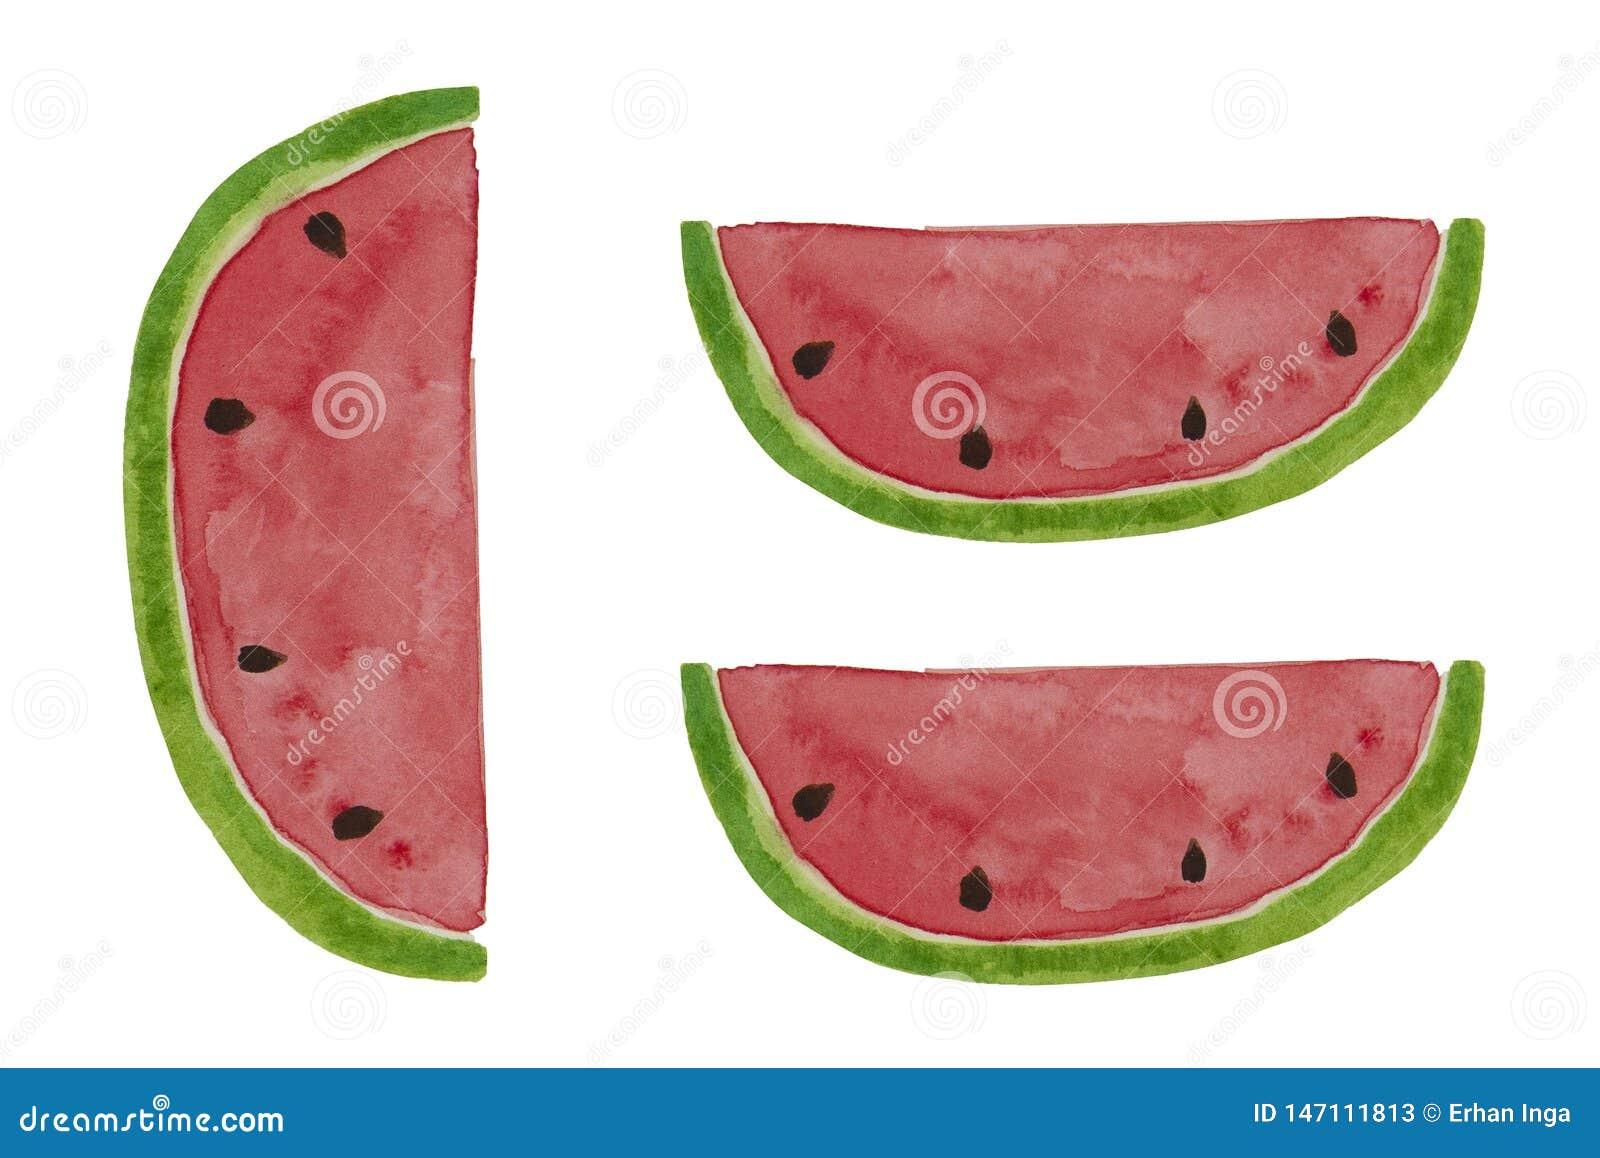 Hand drawn watercolor watermelon slice. Summer illustration. Watermelon design element, template for summer background